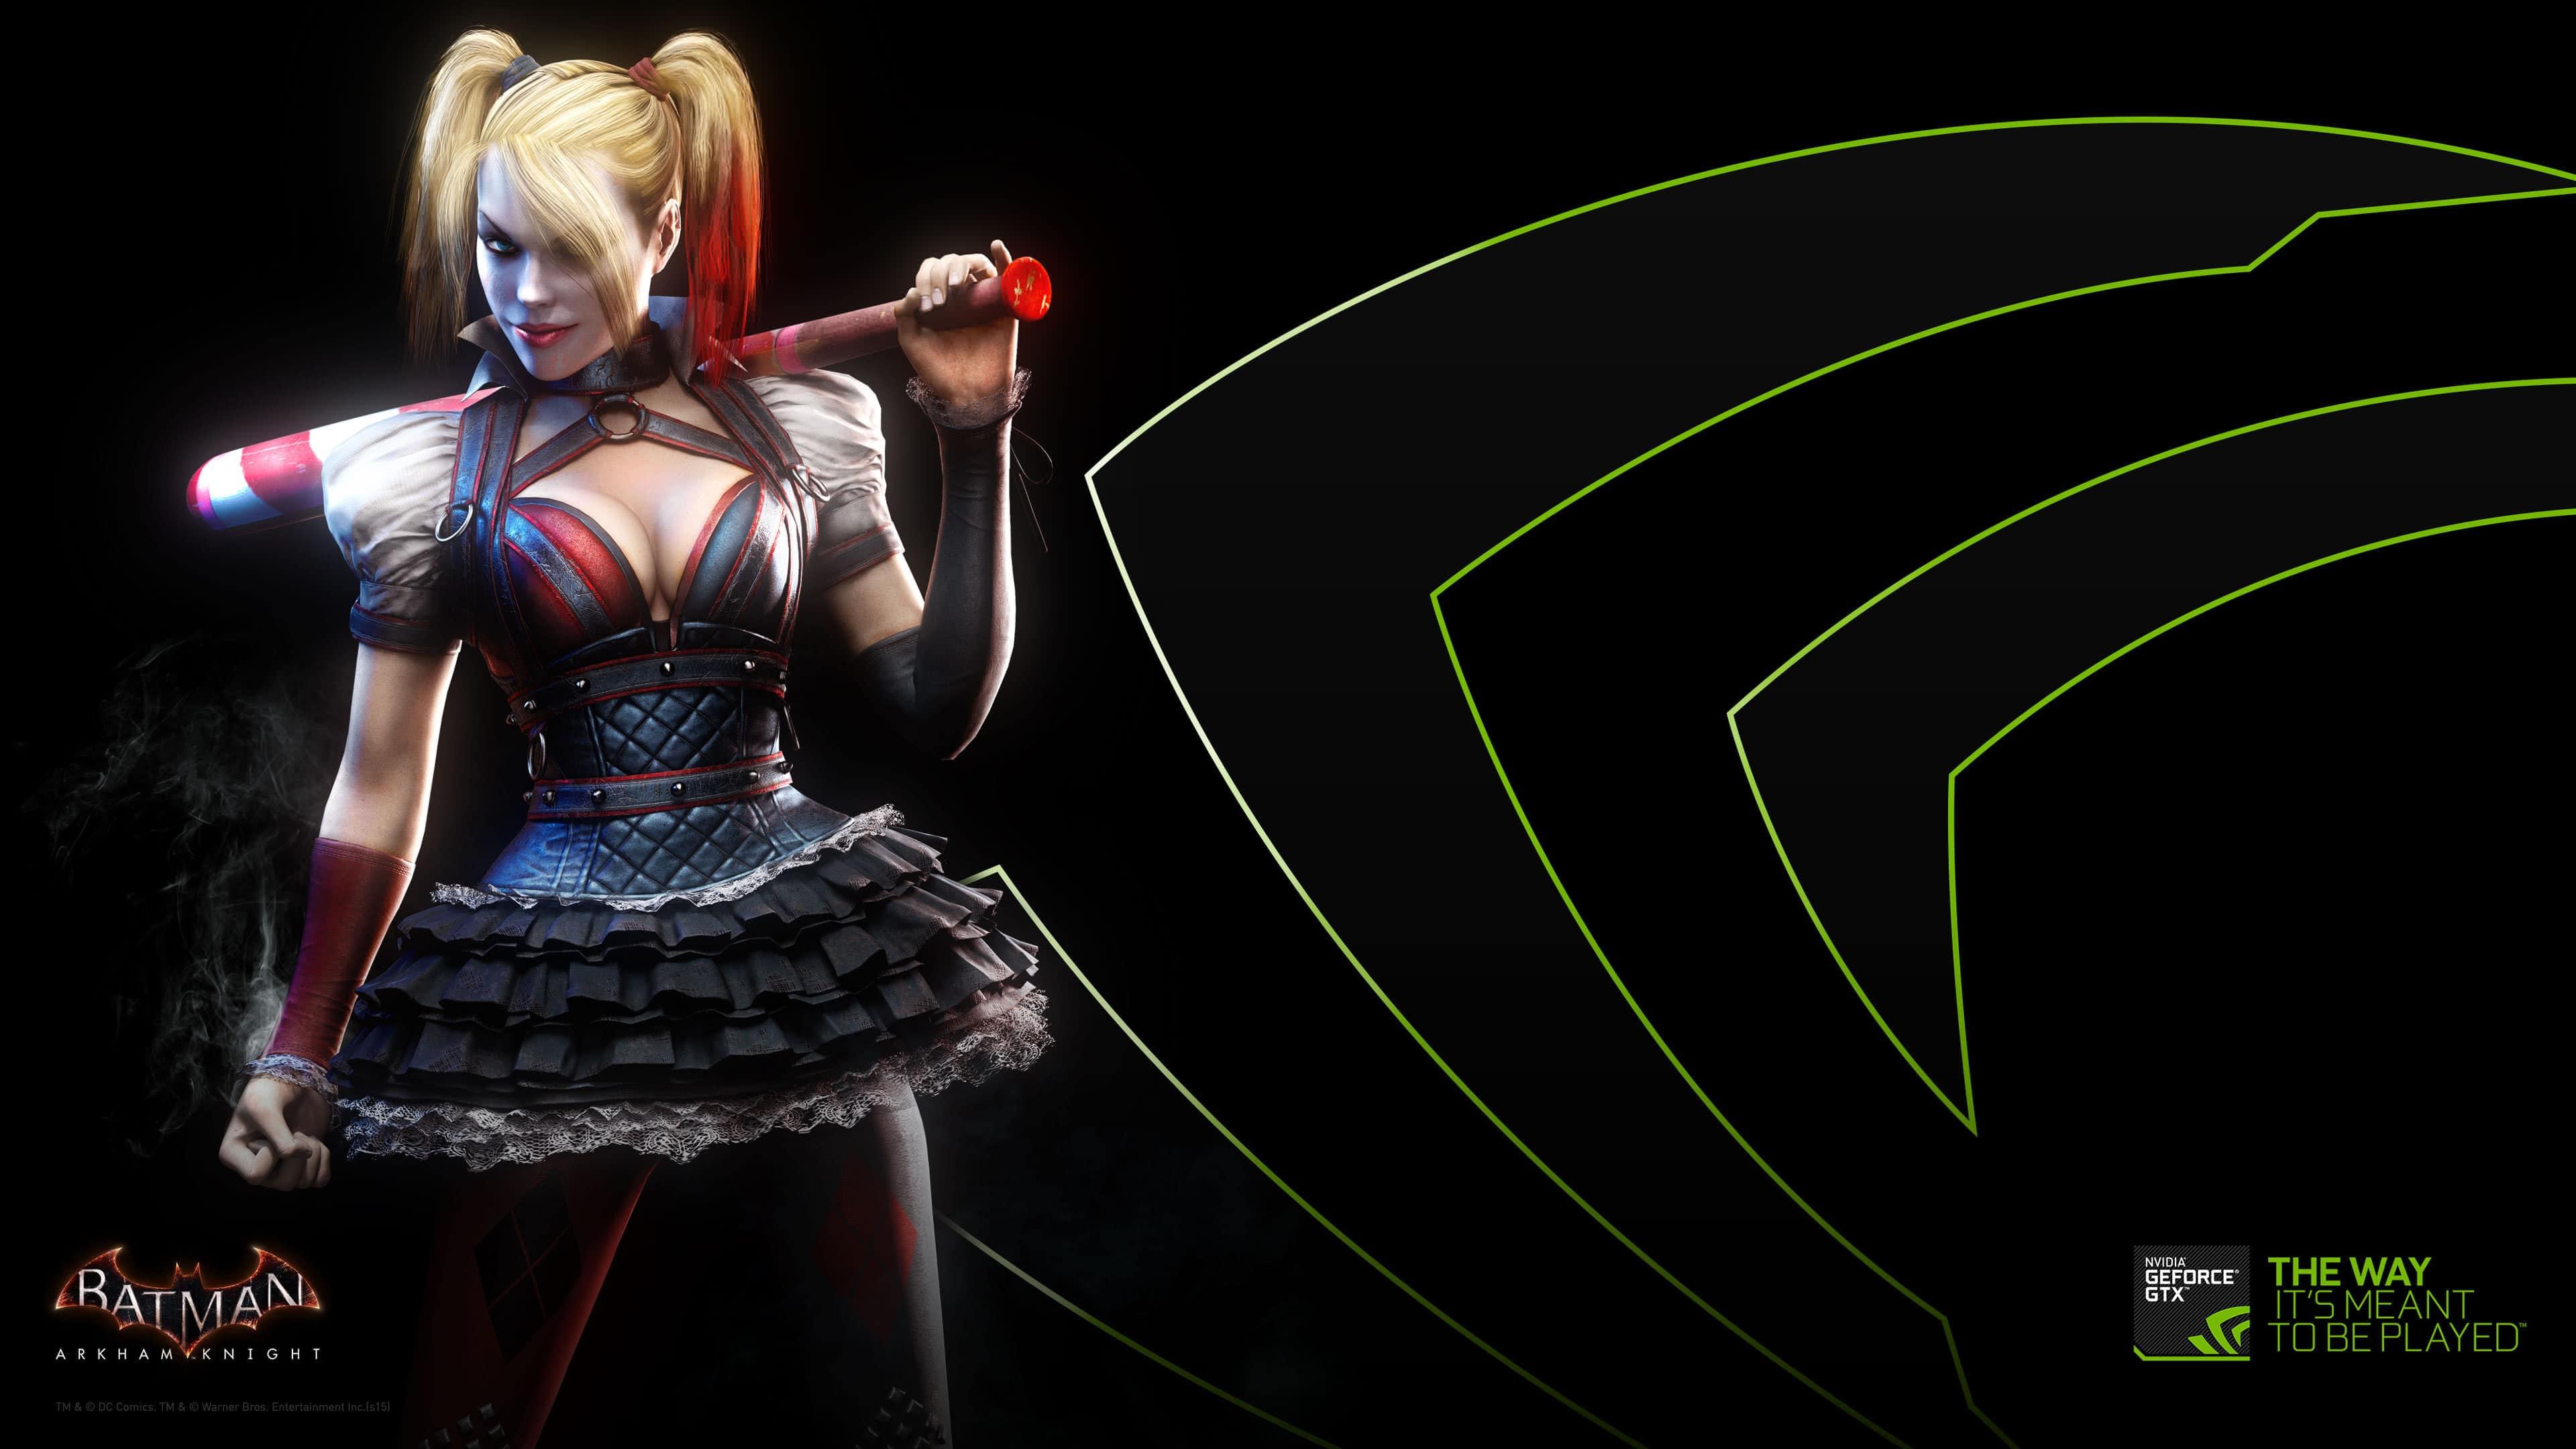 Destop Wallpaper Cars Nvidia Harley Quinn Arkham Knight Uhd 4k Wallpaper Pixelz